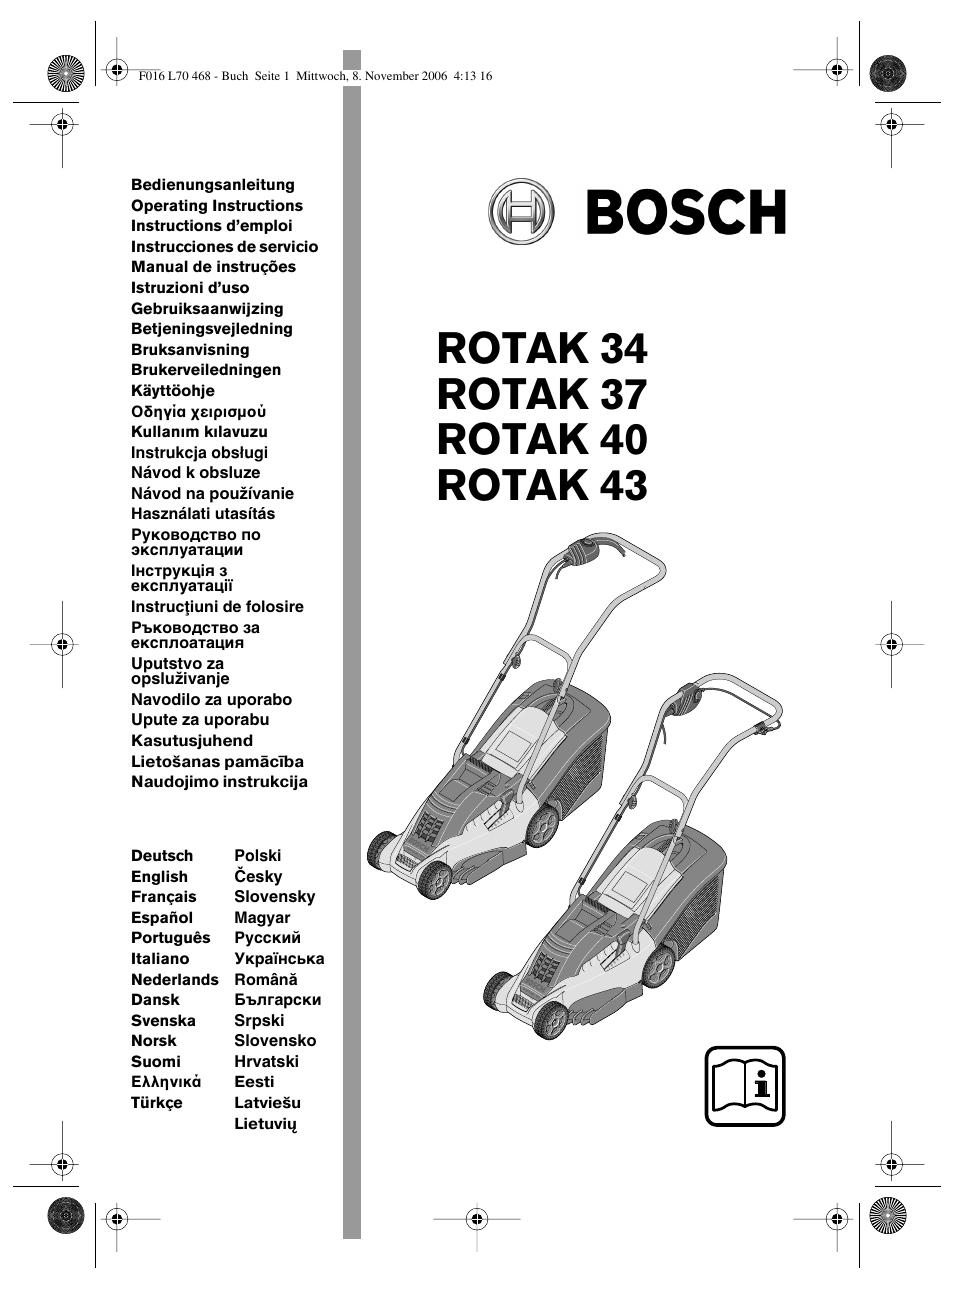 Bosch ROTAK 37 User Manual | 171 pages | Also for: ROTAK 34, ROTAK 40, ROTAK  43